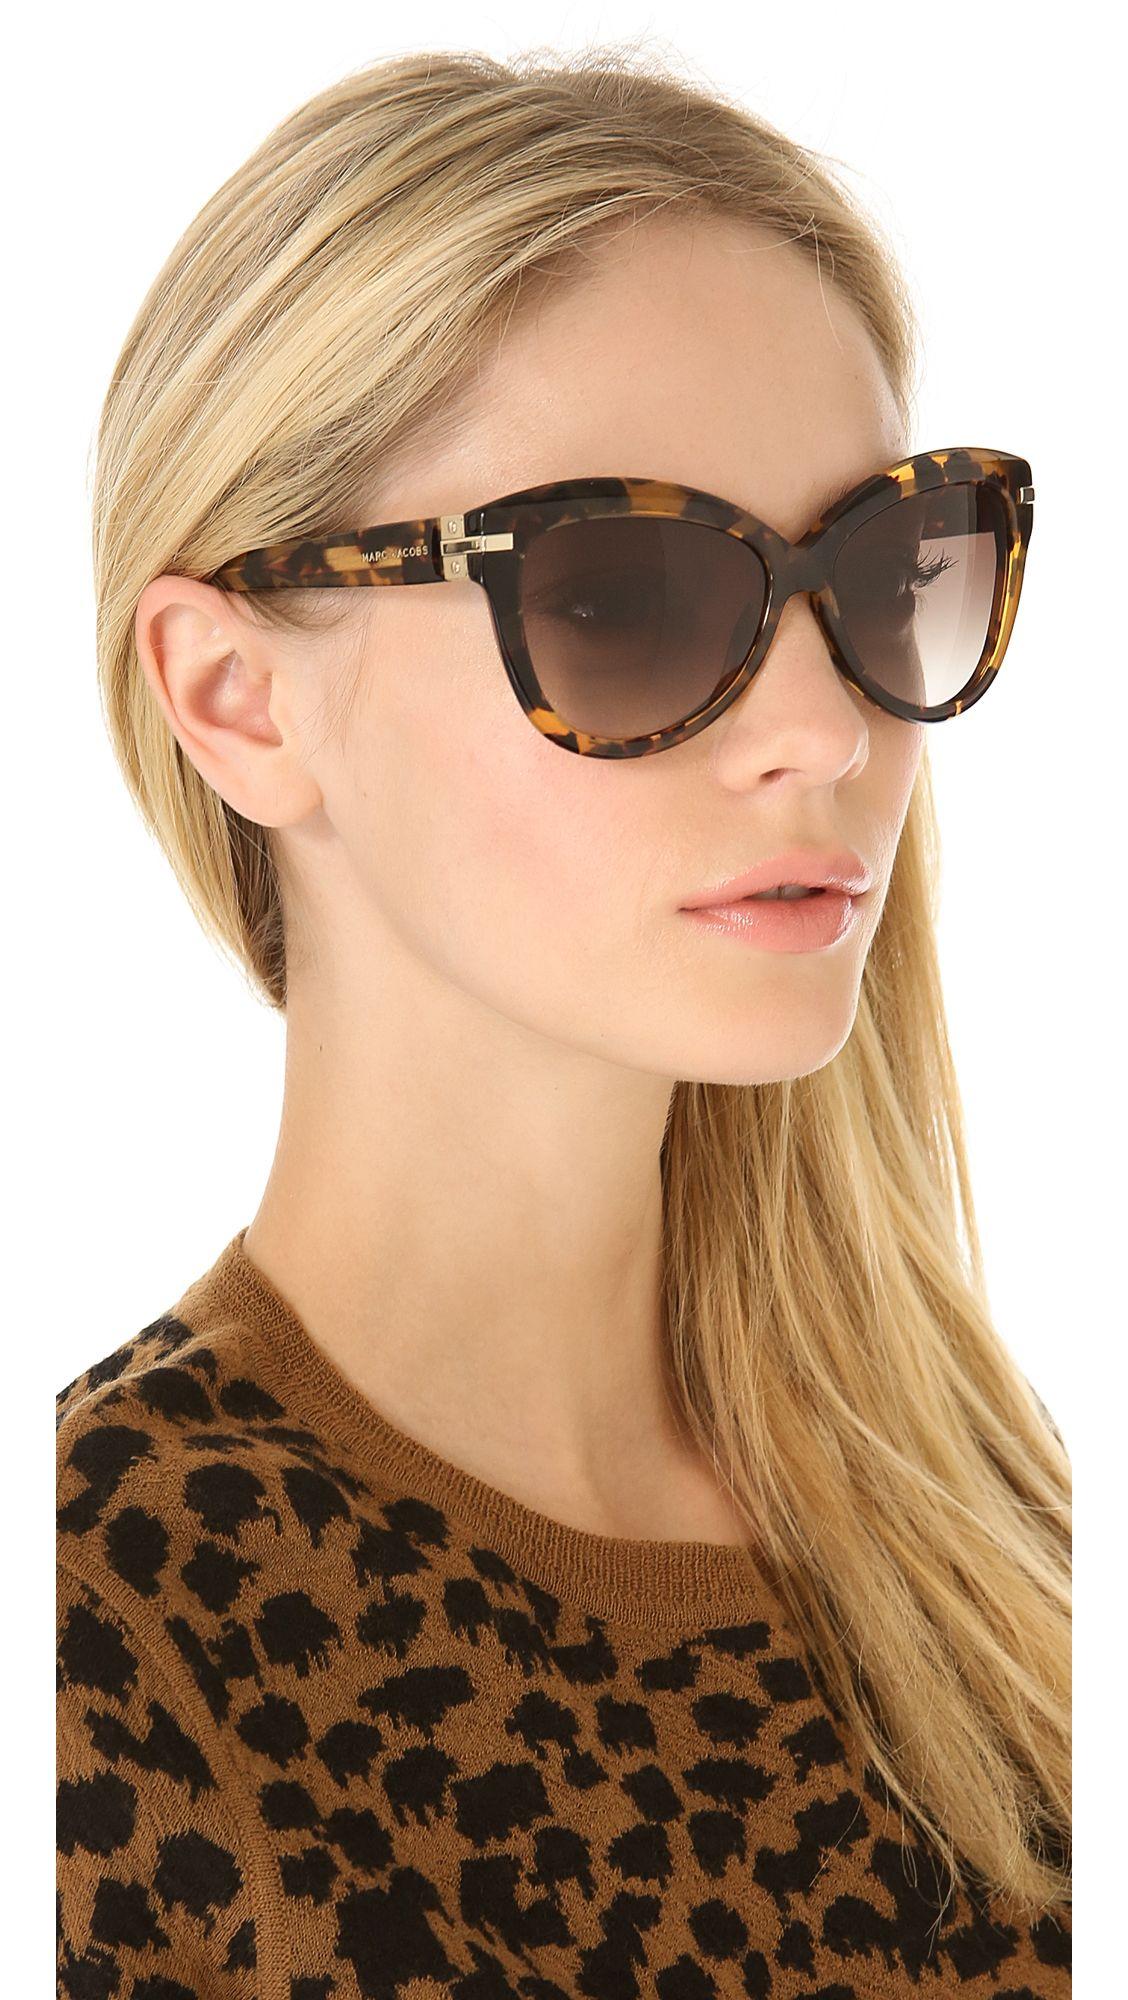 da4b74cb4f1e marc-jacobs-sunglasses-havana-exaggerated-cat-eye-sunglasses | Sun ...